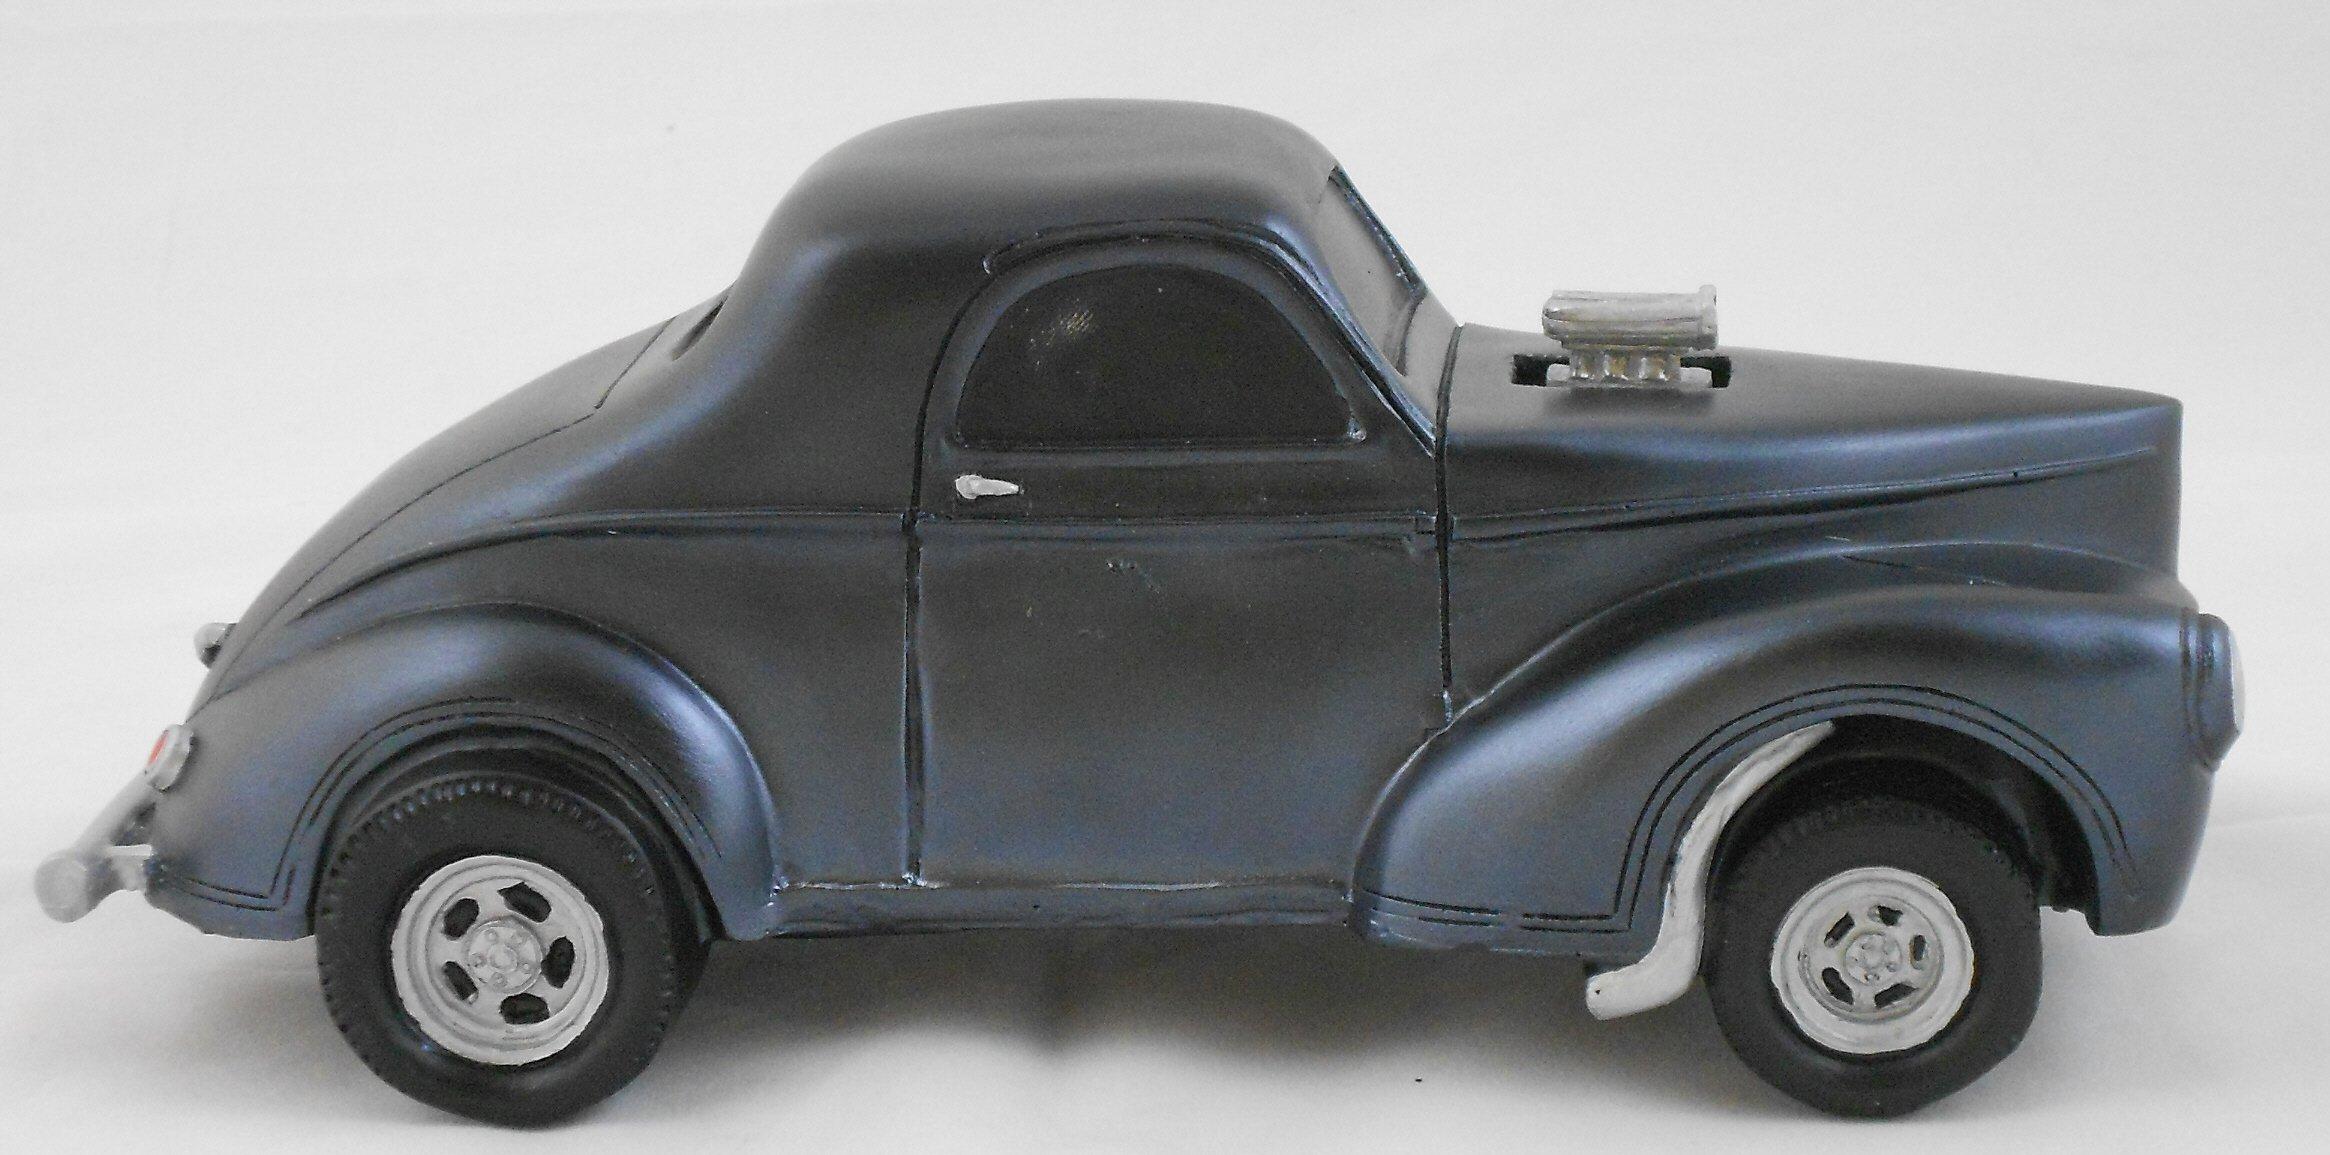 Gasser Model 1941 Willys 1:18 Scale Black by Gasser Models (Image #4)